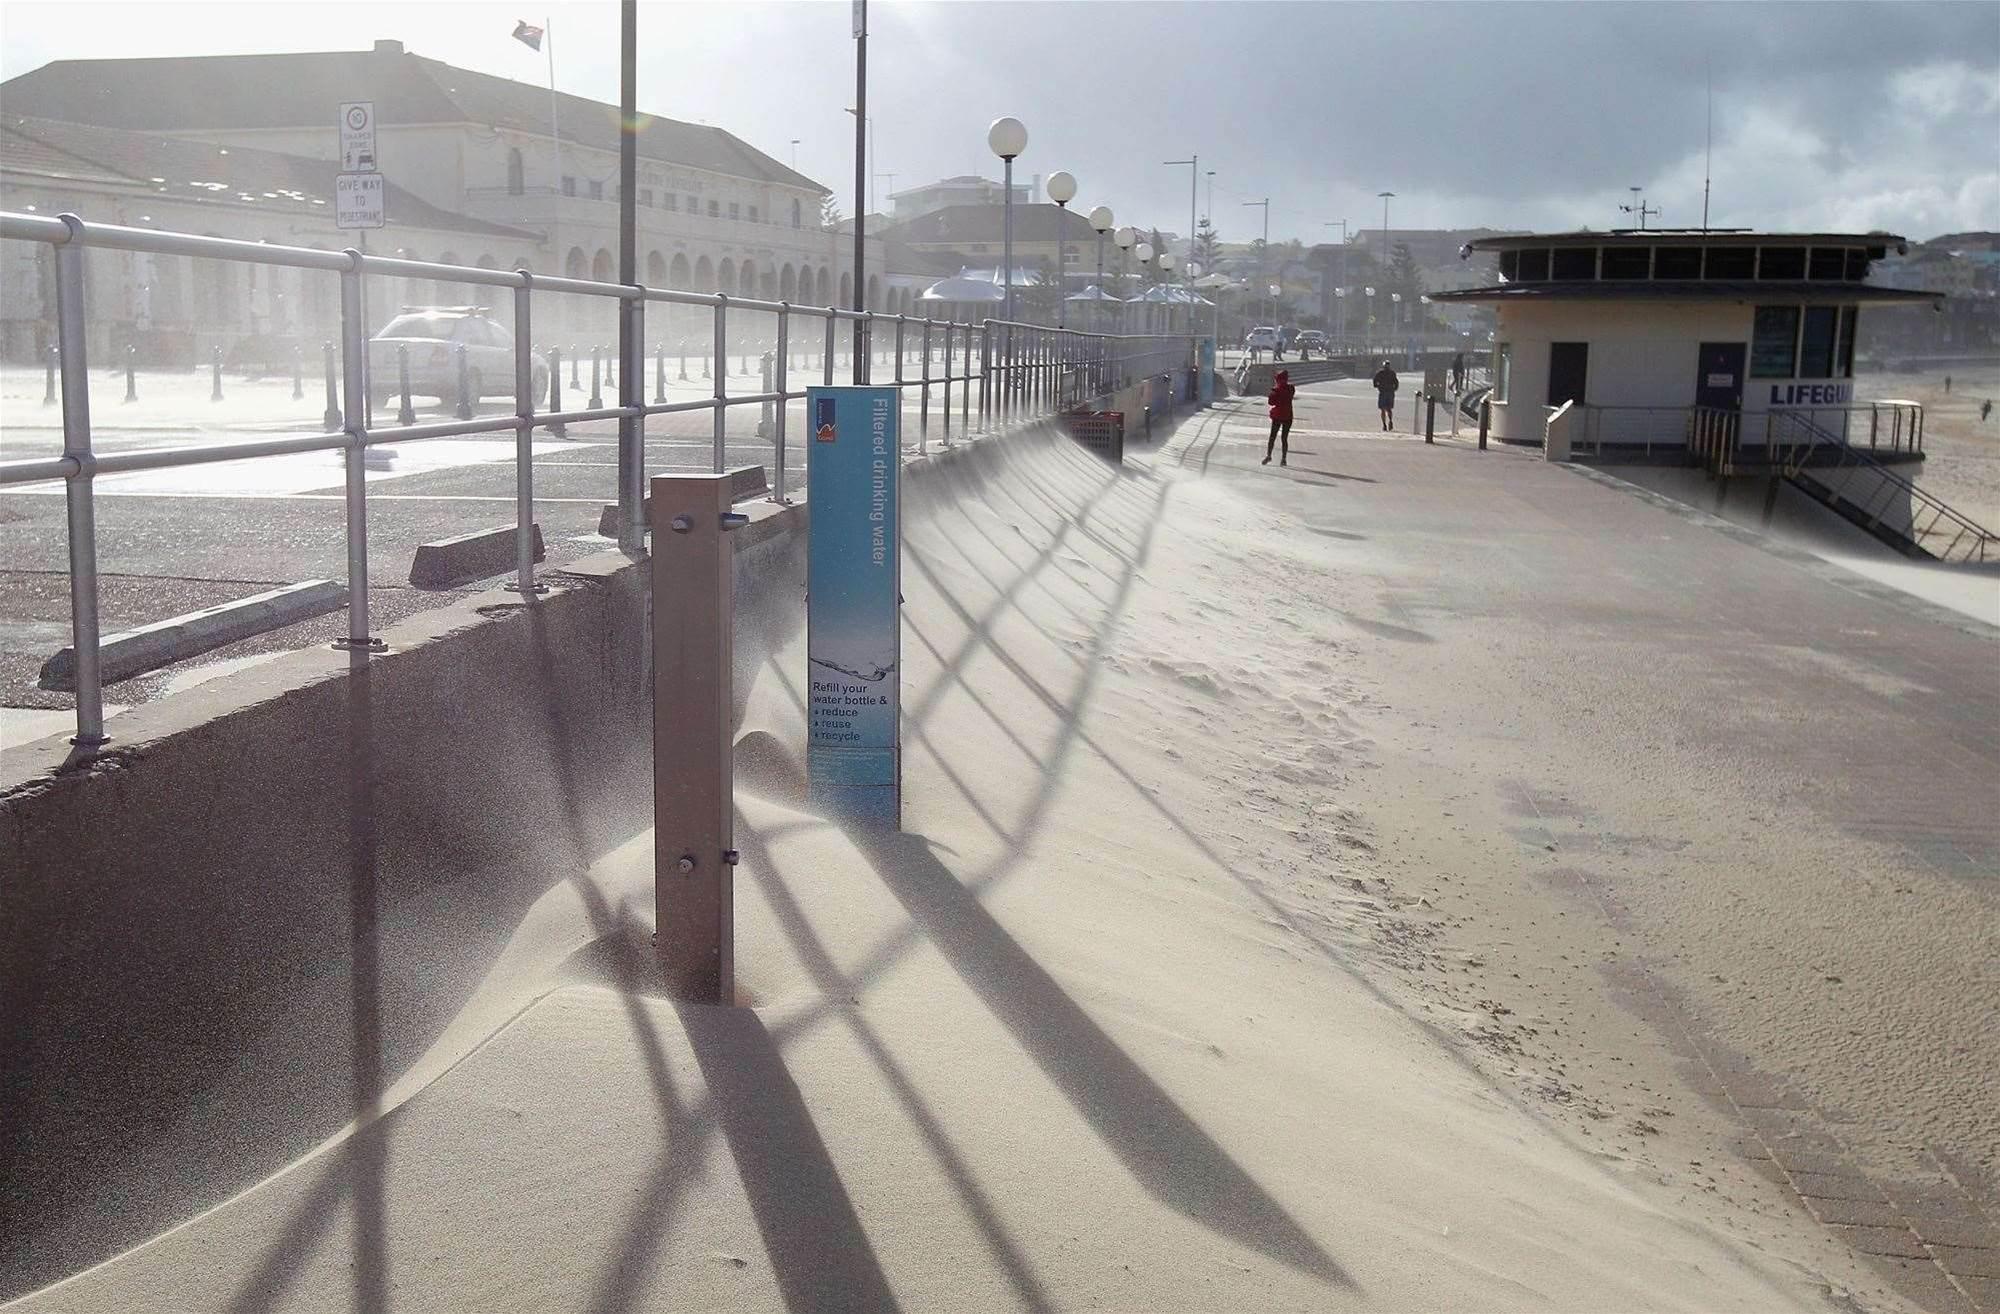 Bondi Beach to get free wi-fi